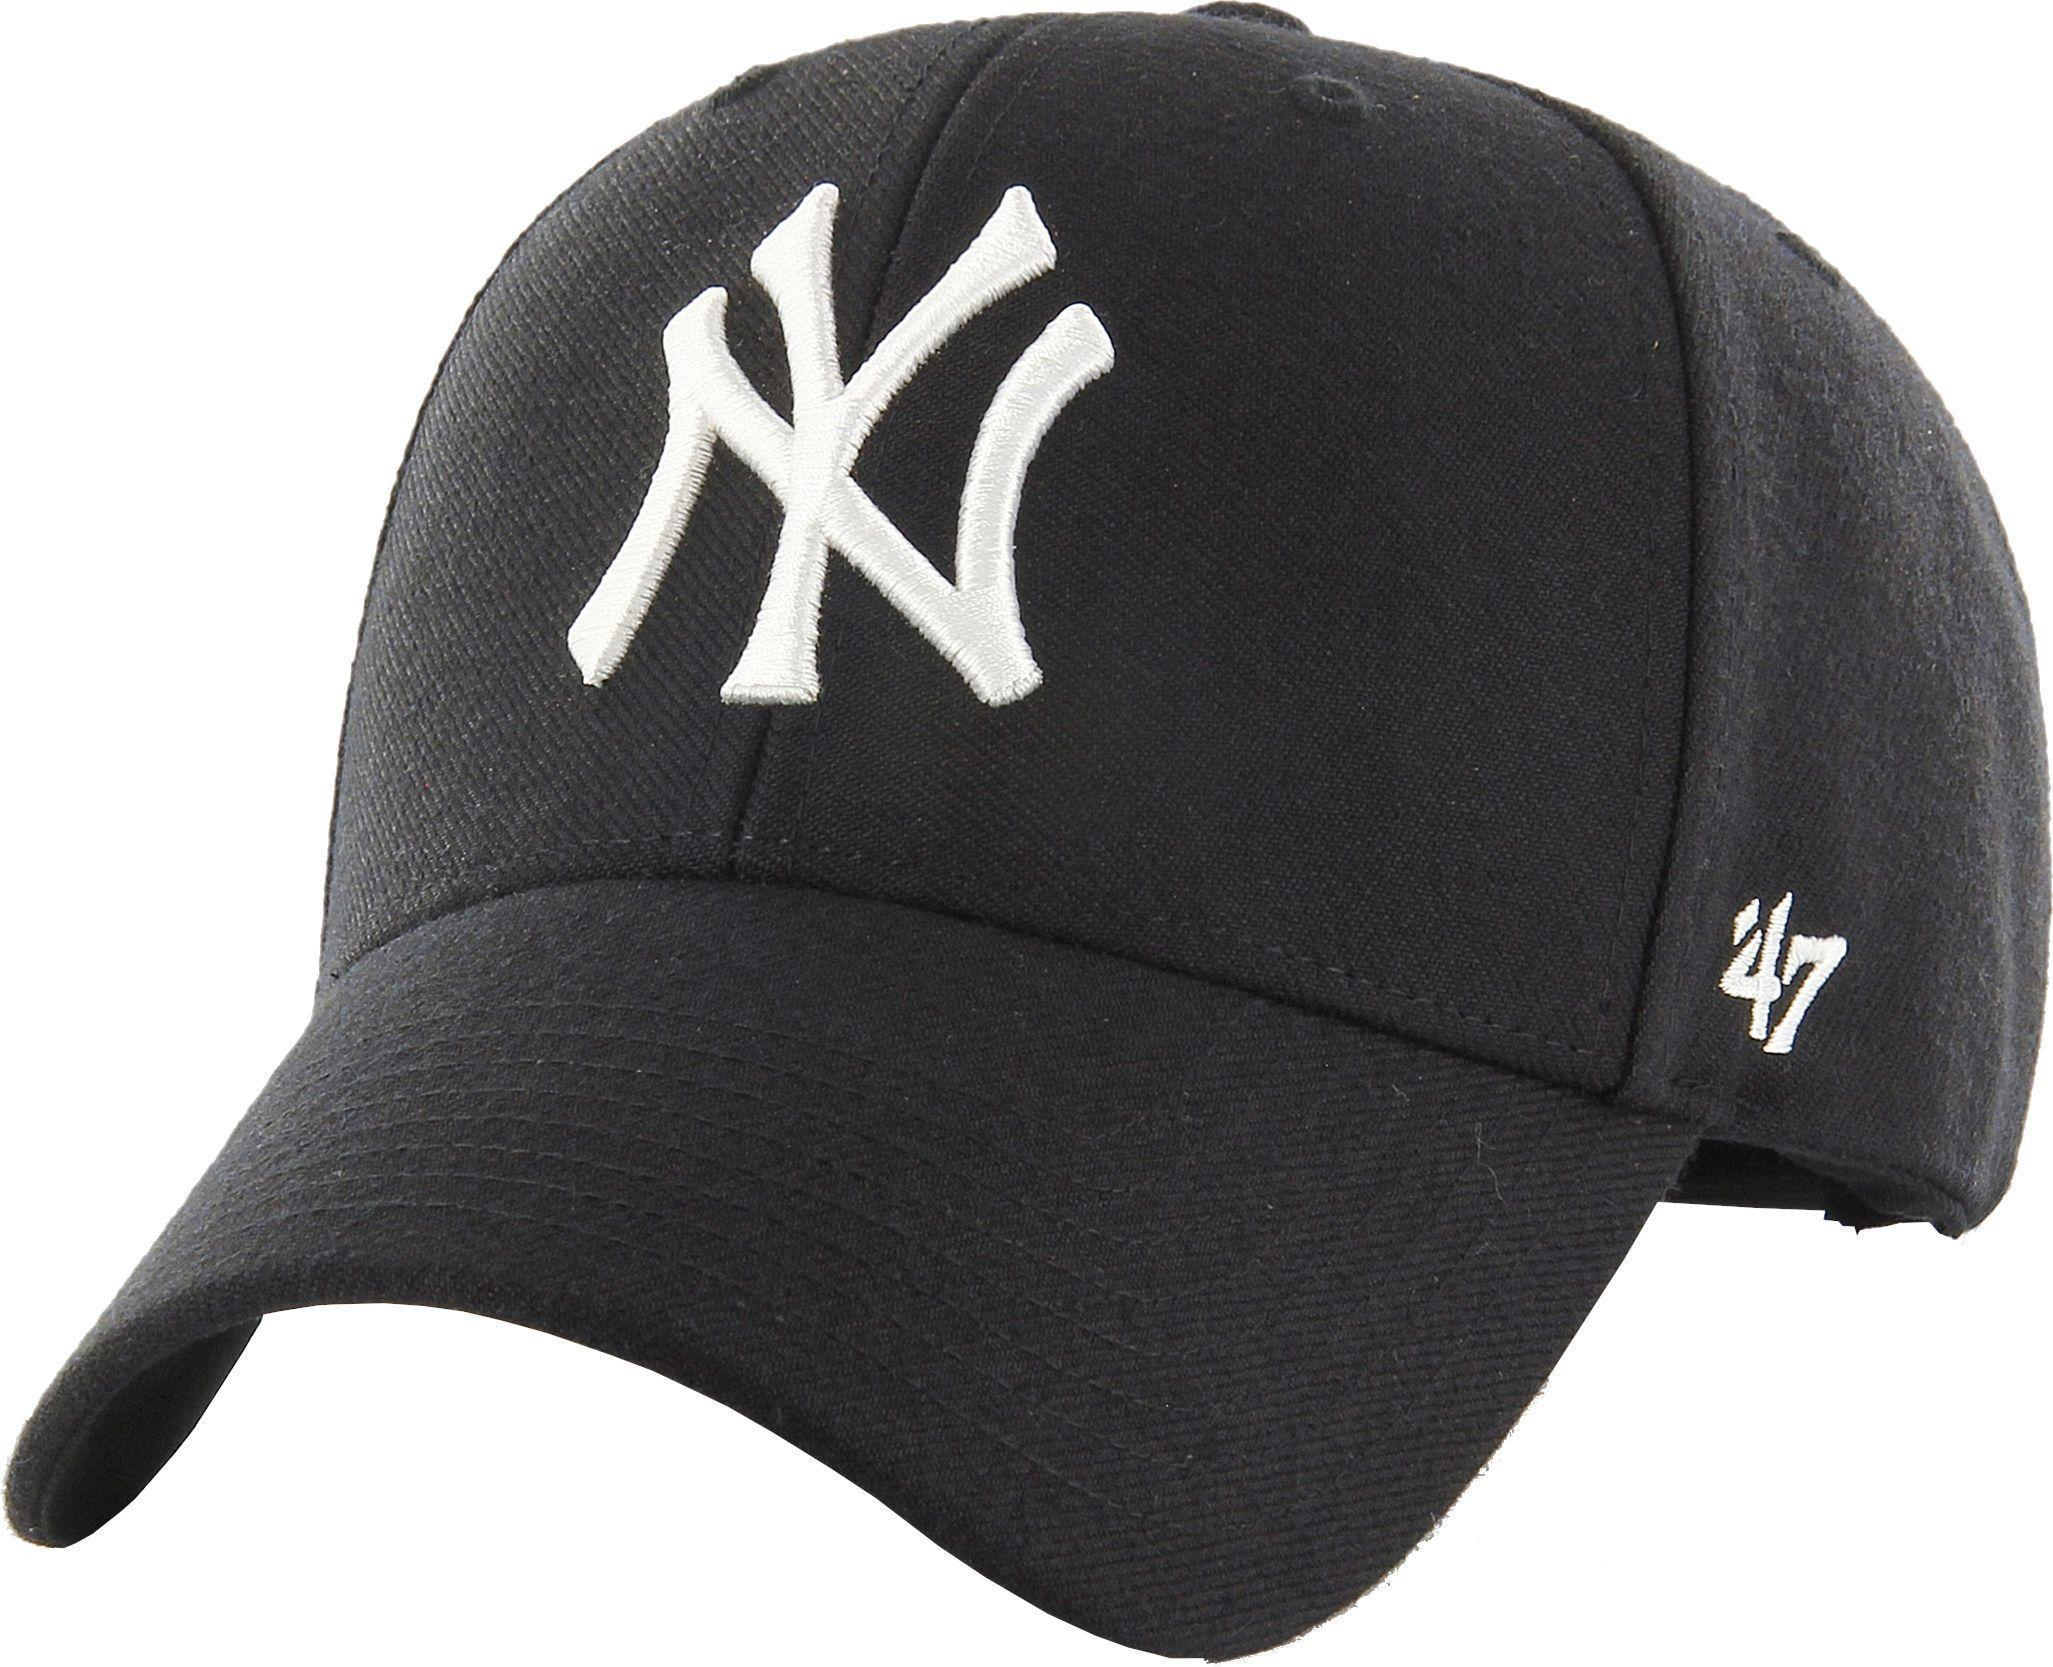 201613b0a56b15 47 Brand New York Yankees '47 Mvp Adjustable Baseball Cap in Black ...